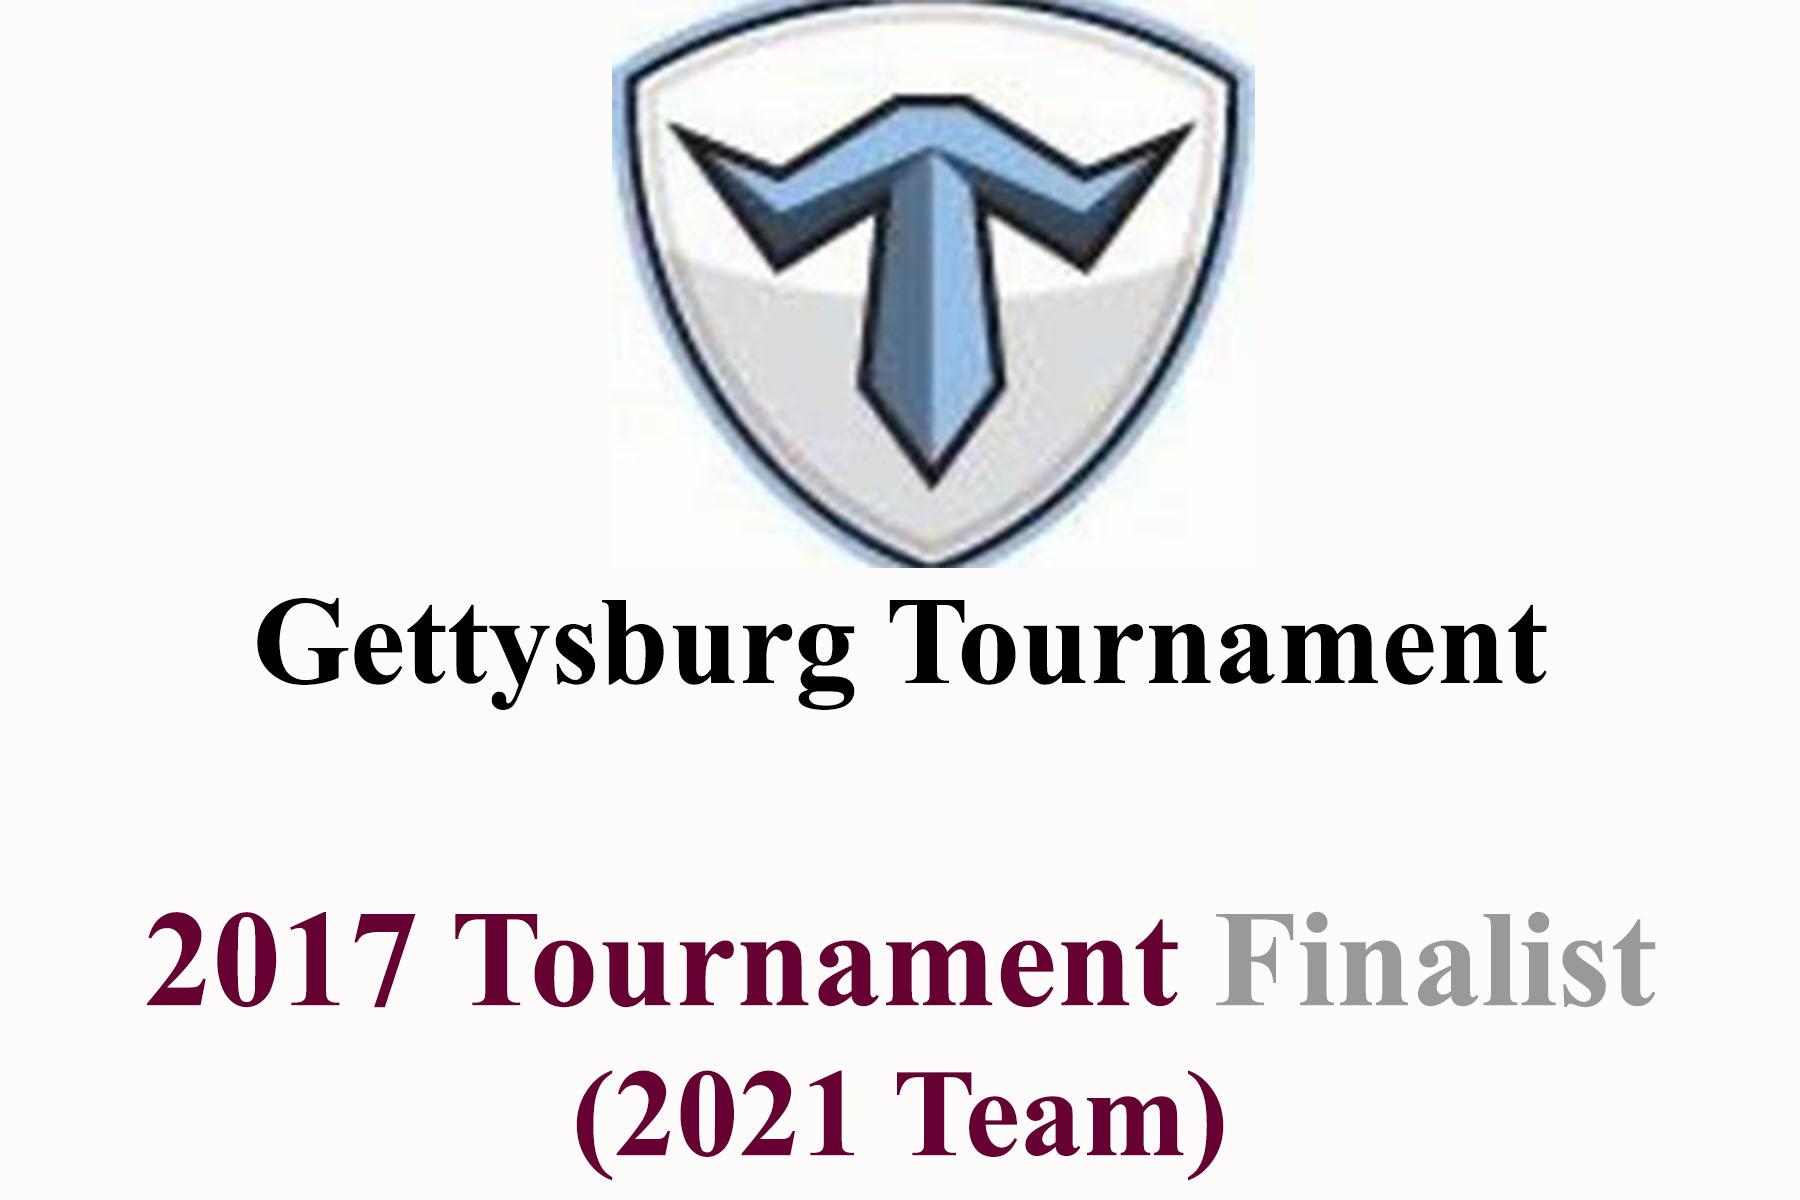 gettysburg 2021